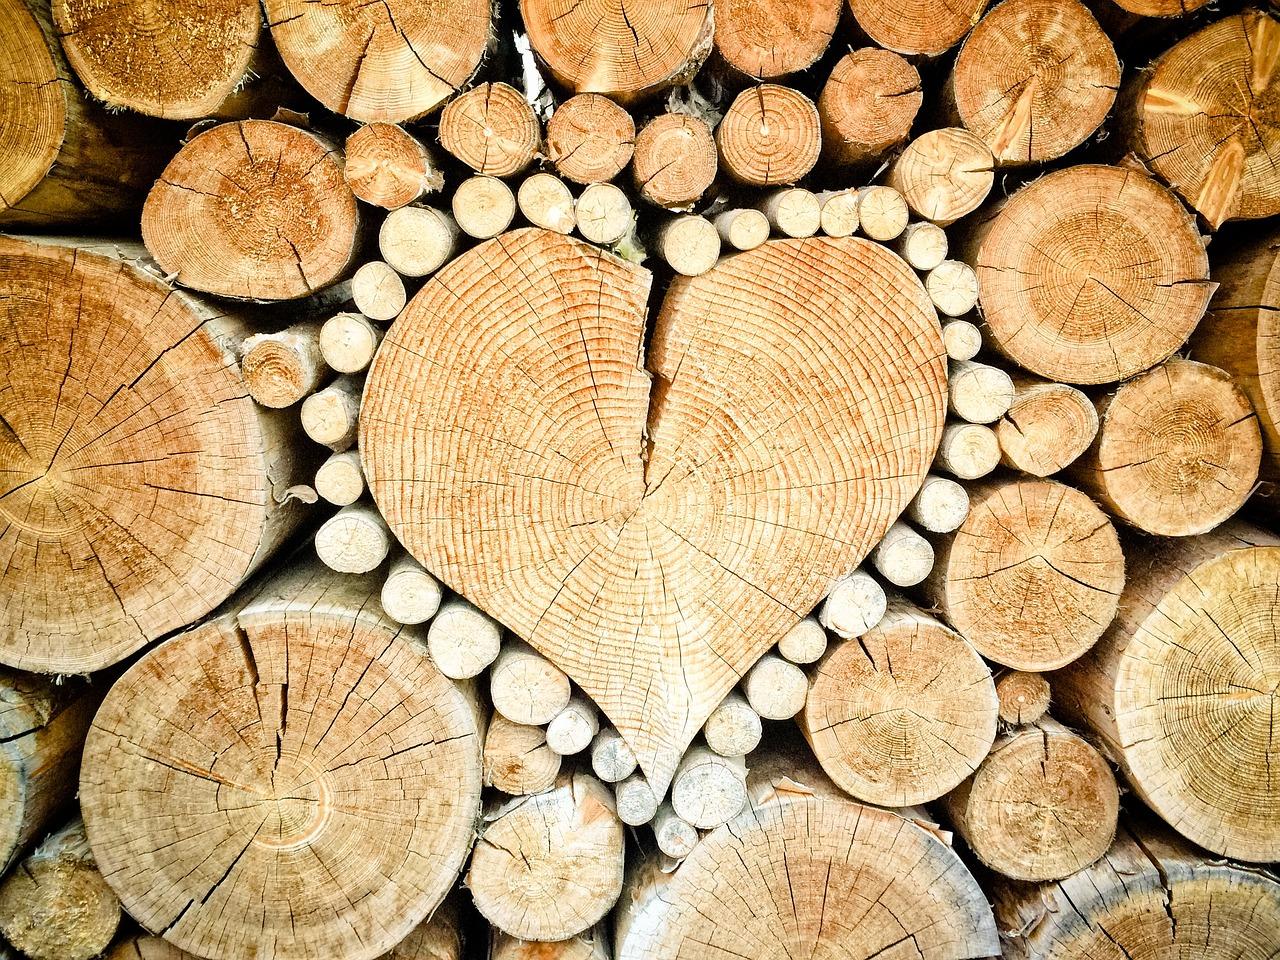 heart-1288420_1280